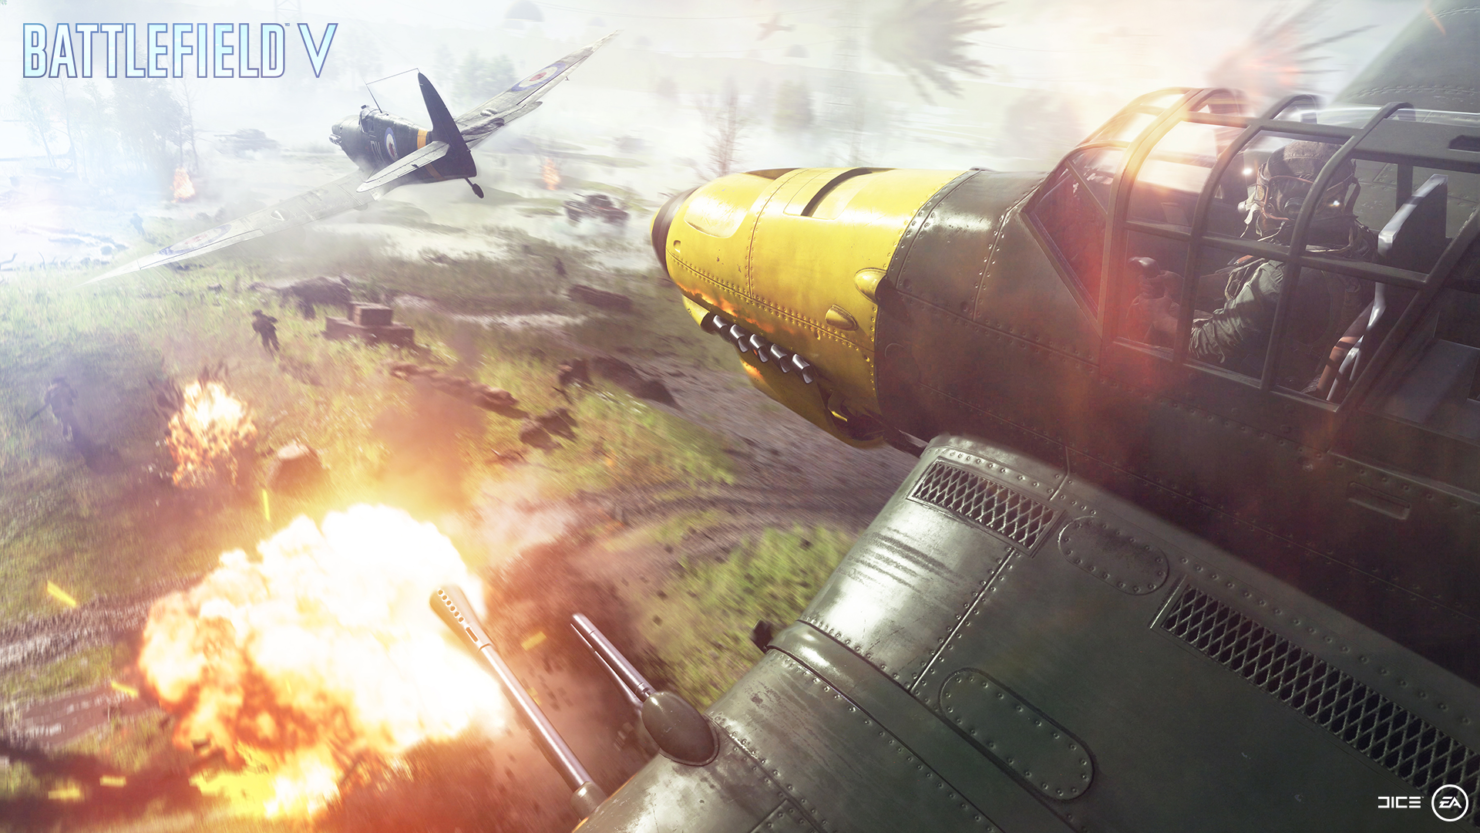 battlefield-v-reveal-screenshot-007